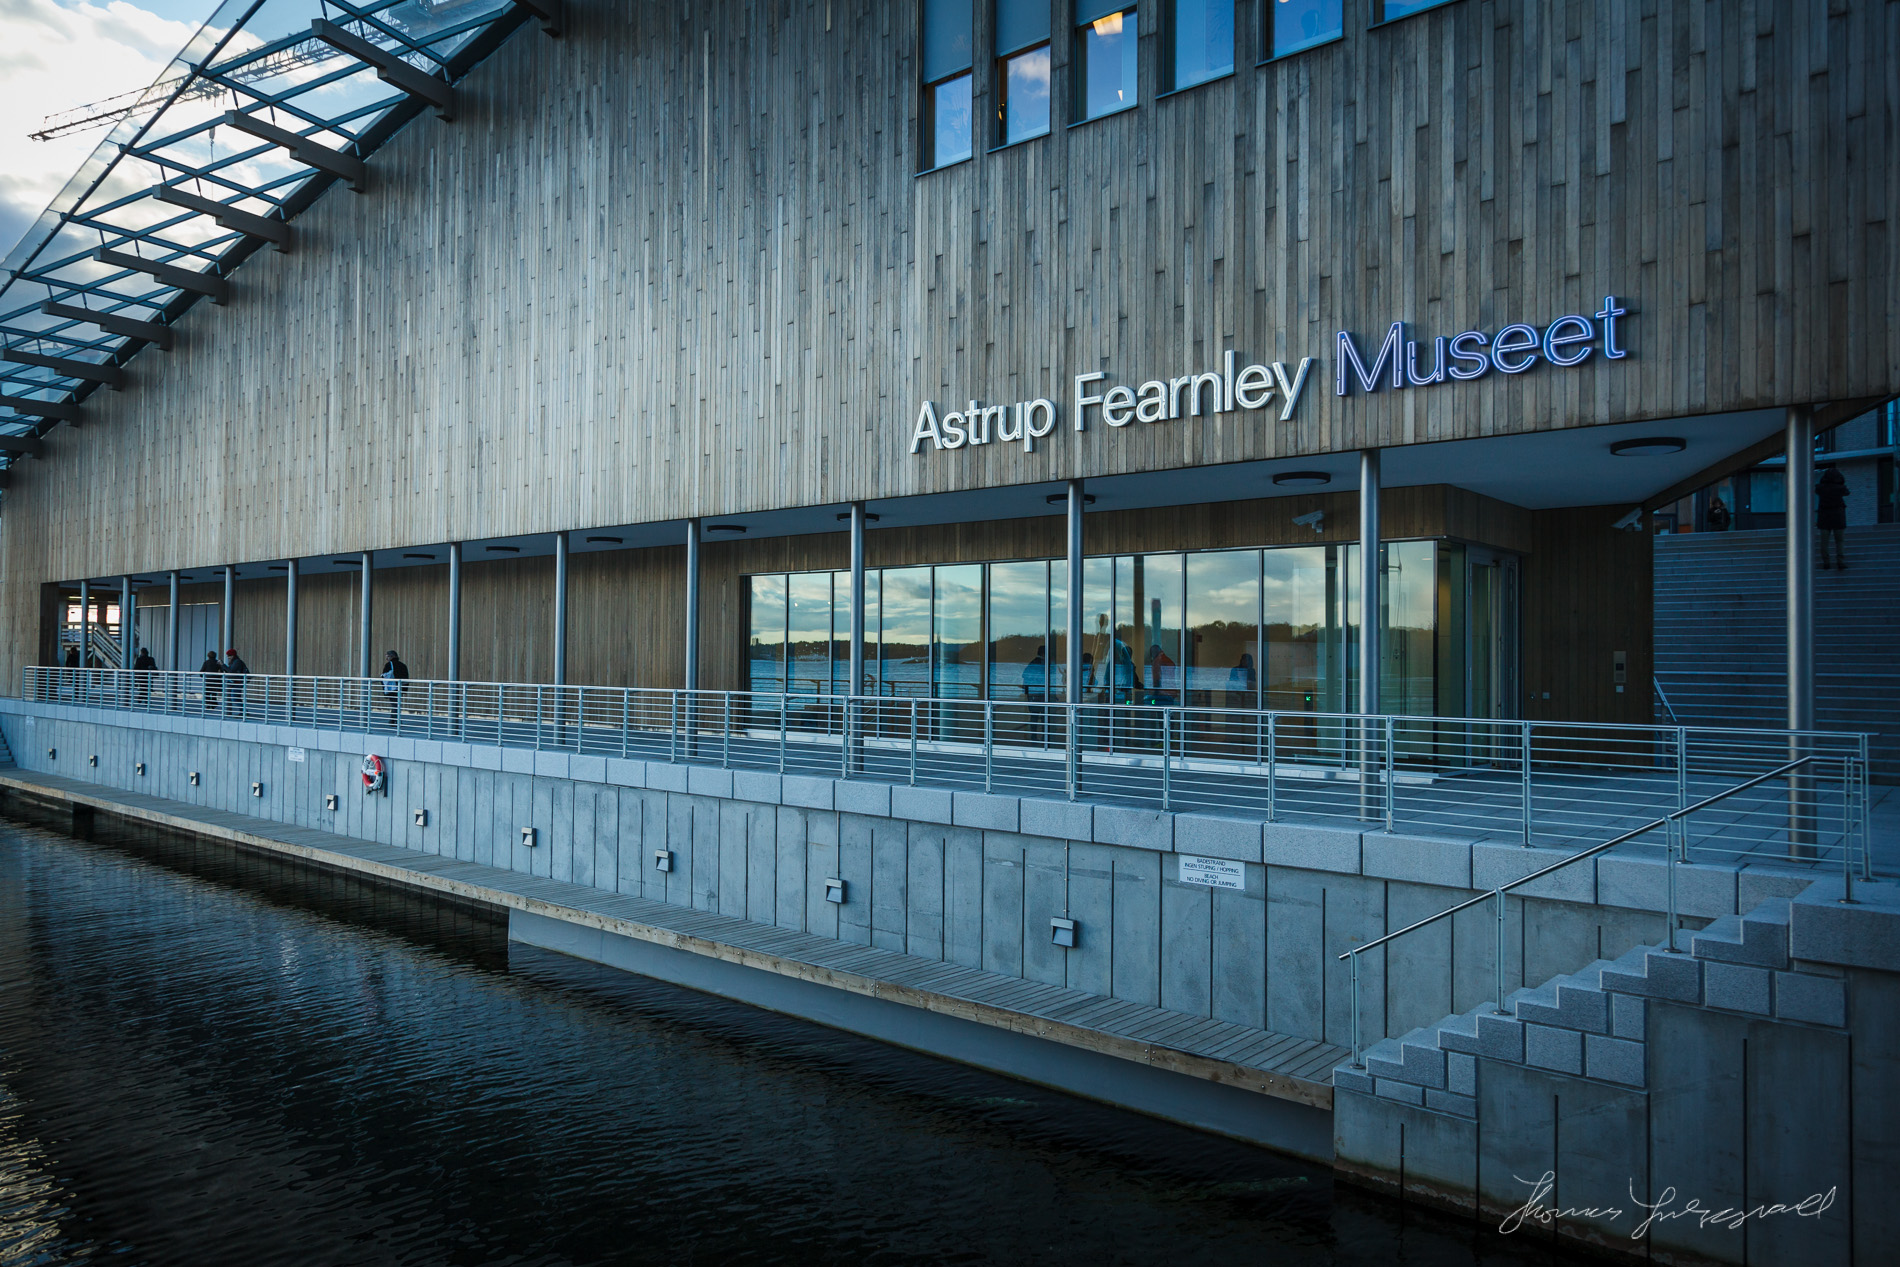 Astrup Farneley Museum